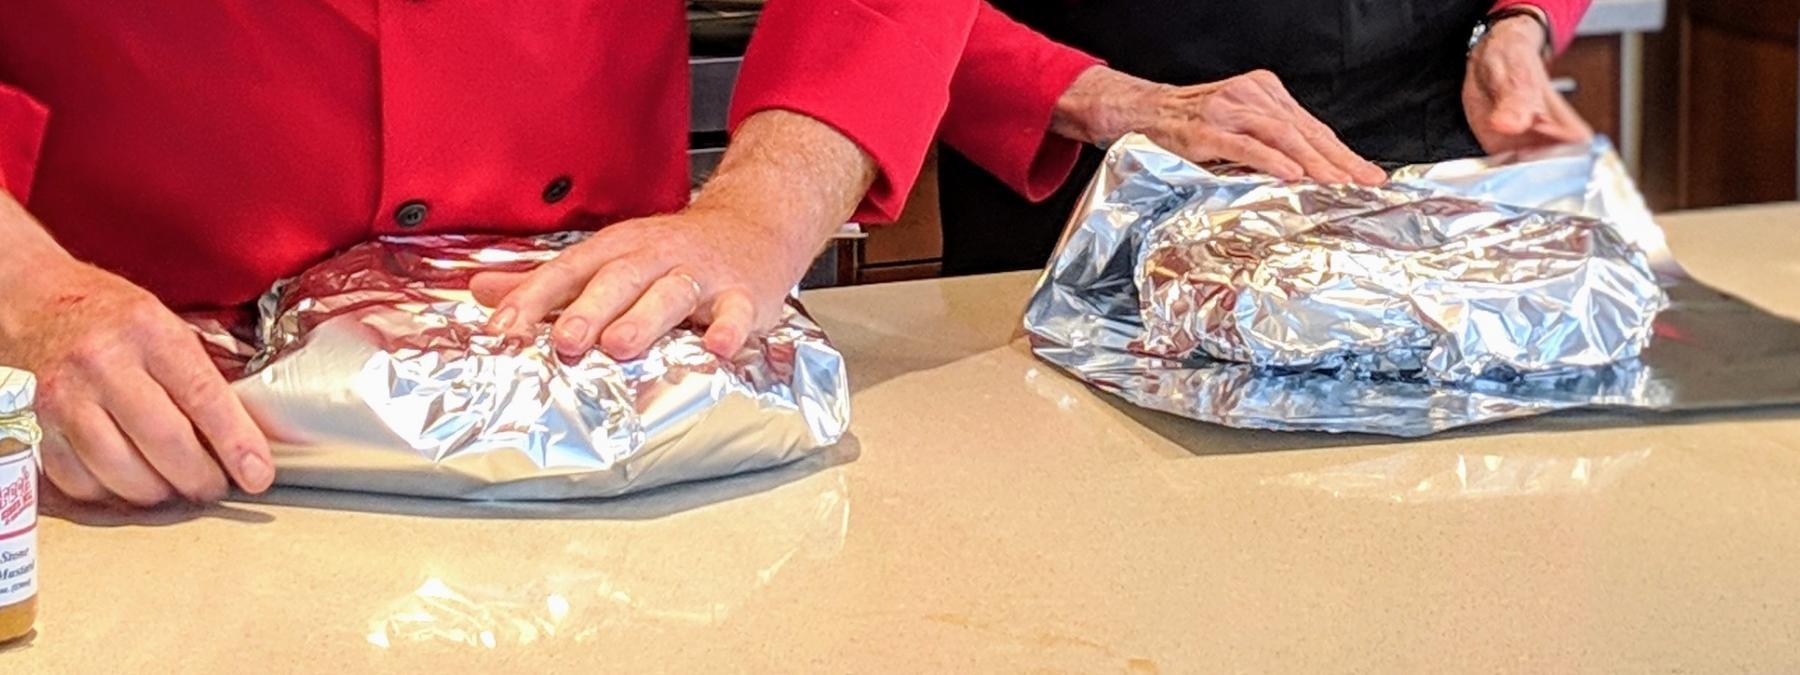 Wrap with Foil